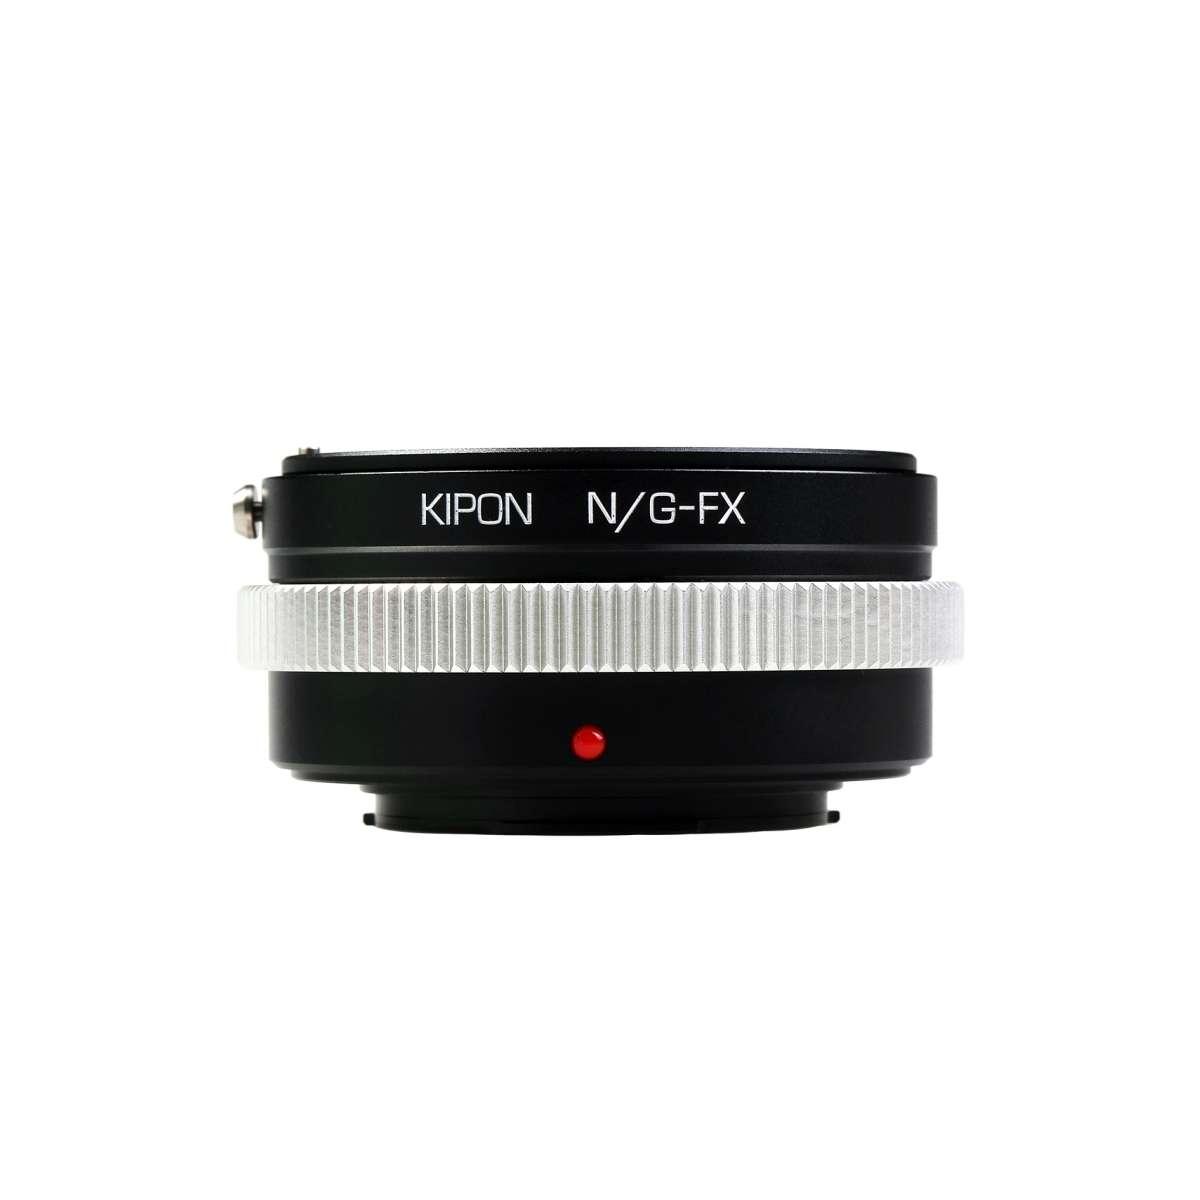 Kipon Adapter Fr Nikon G Auf Fuji X Foto Walser Lens To Fujifilm Gfx Camera